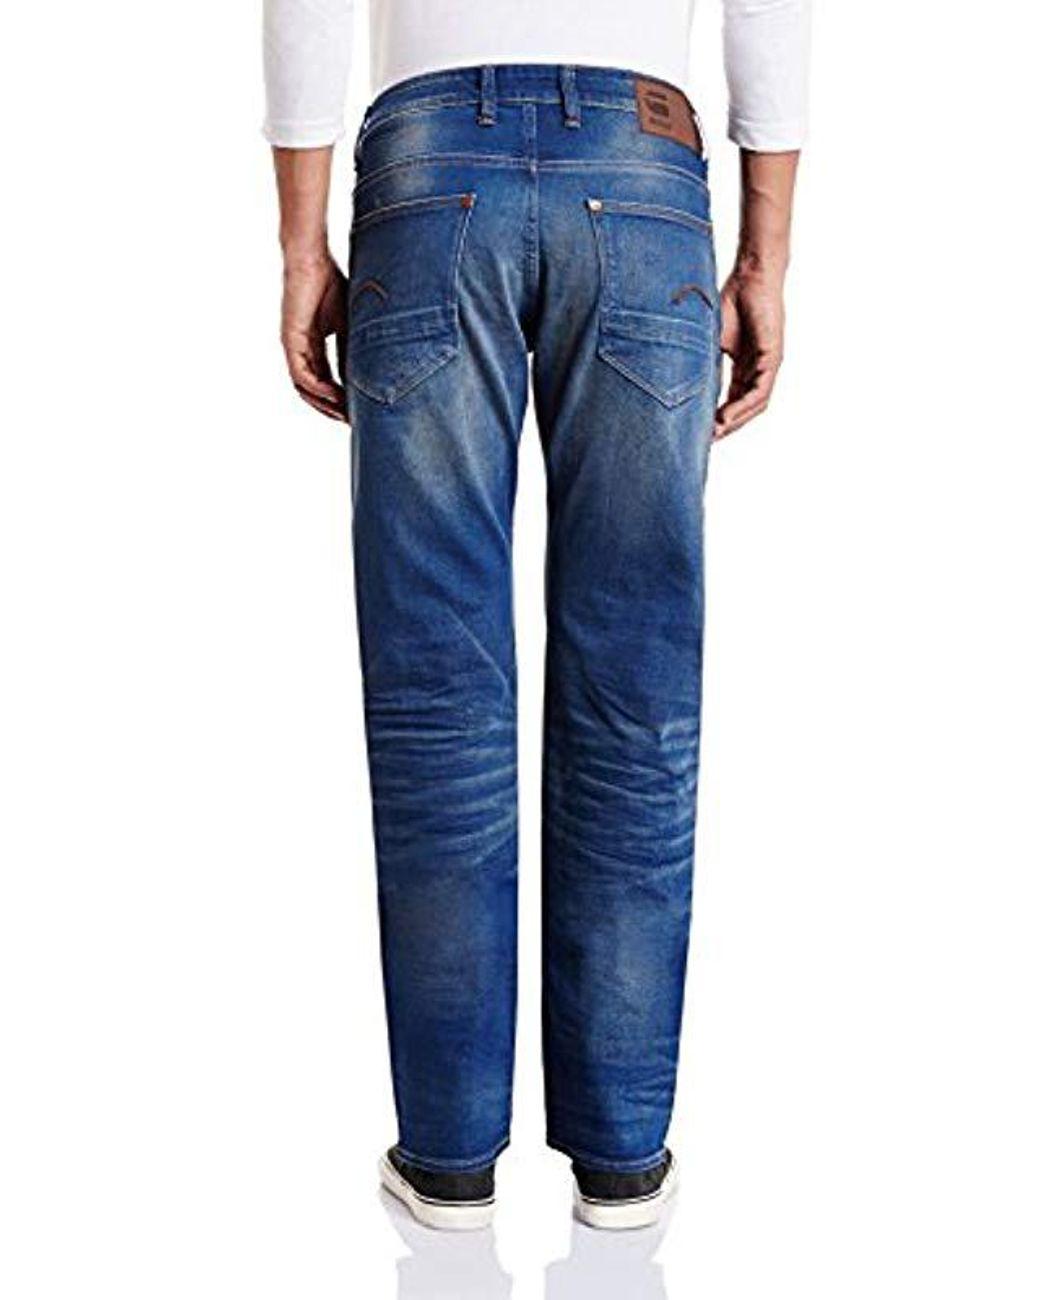 024e47fdad2e42 Lyst - G-Star RAW Revend Straight in Blue for Men - Save 36%